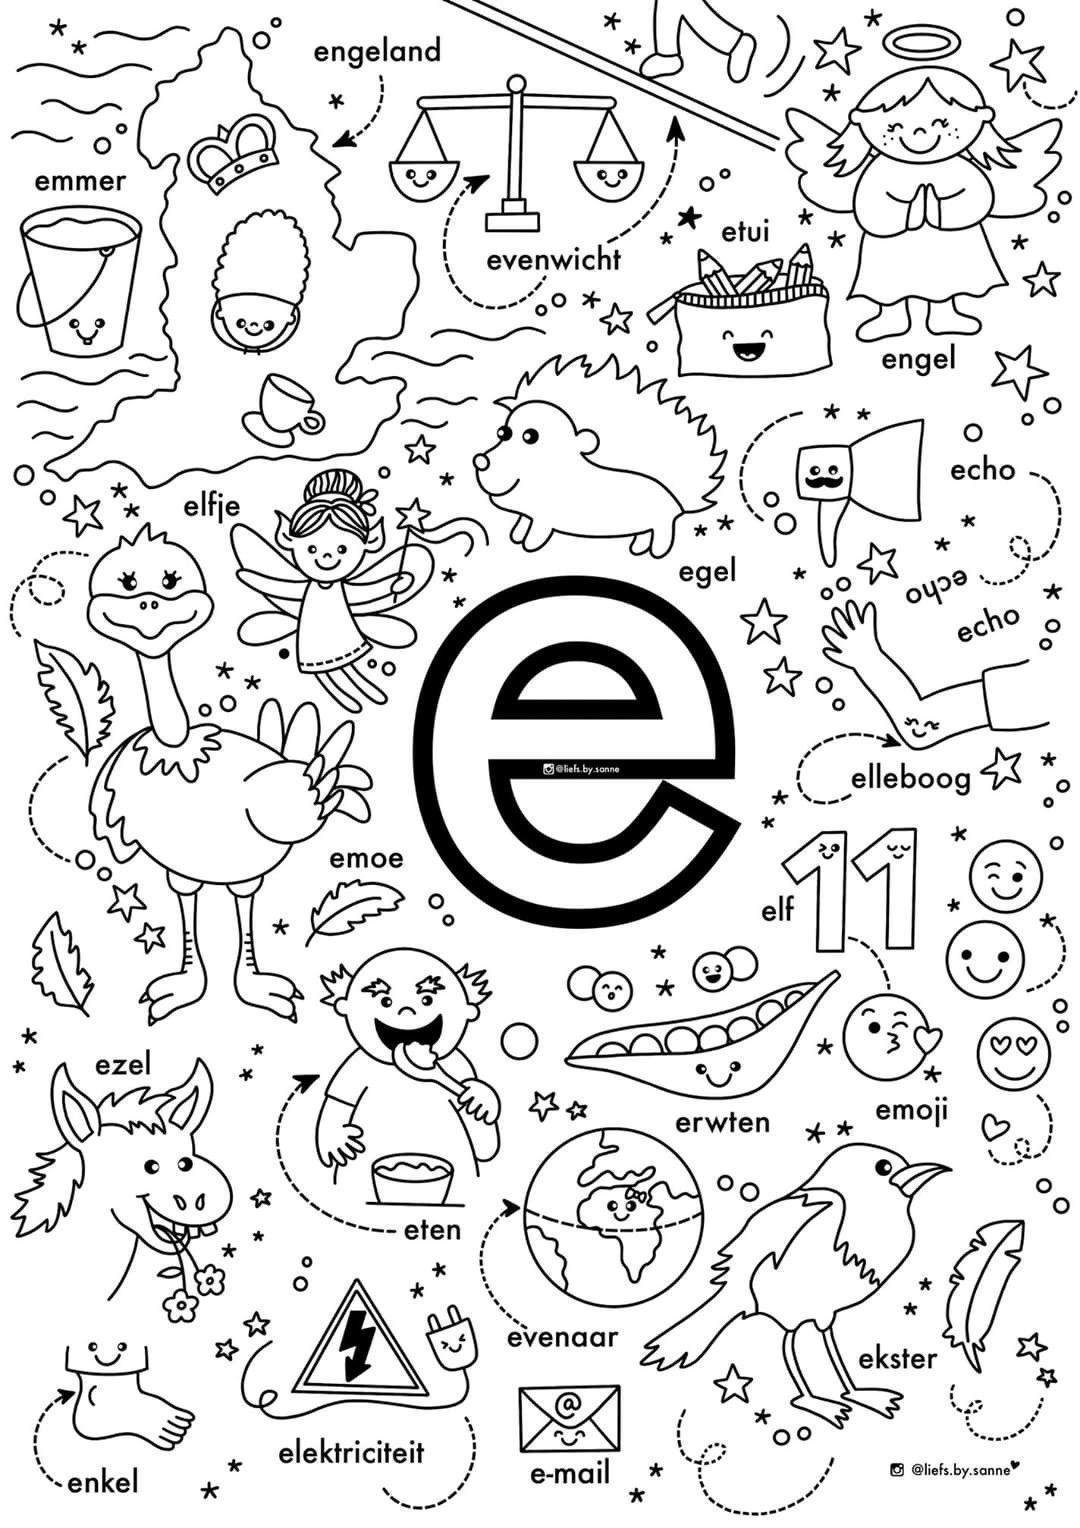 E Woorden Kleurplaat In 2020 Letterherkenning Spelletjes Alfabet Boek Letterherkenning